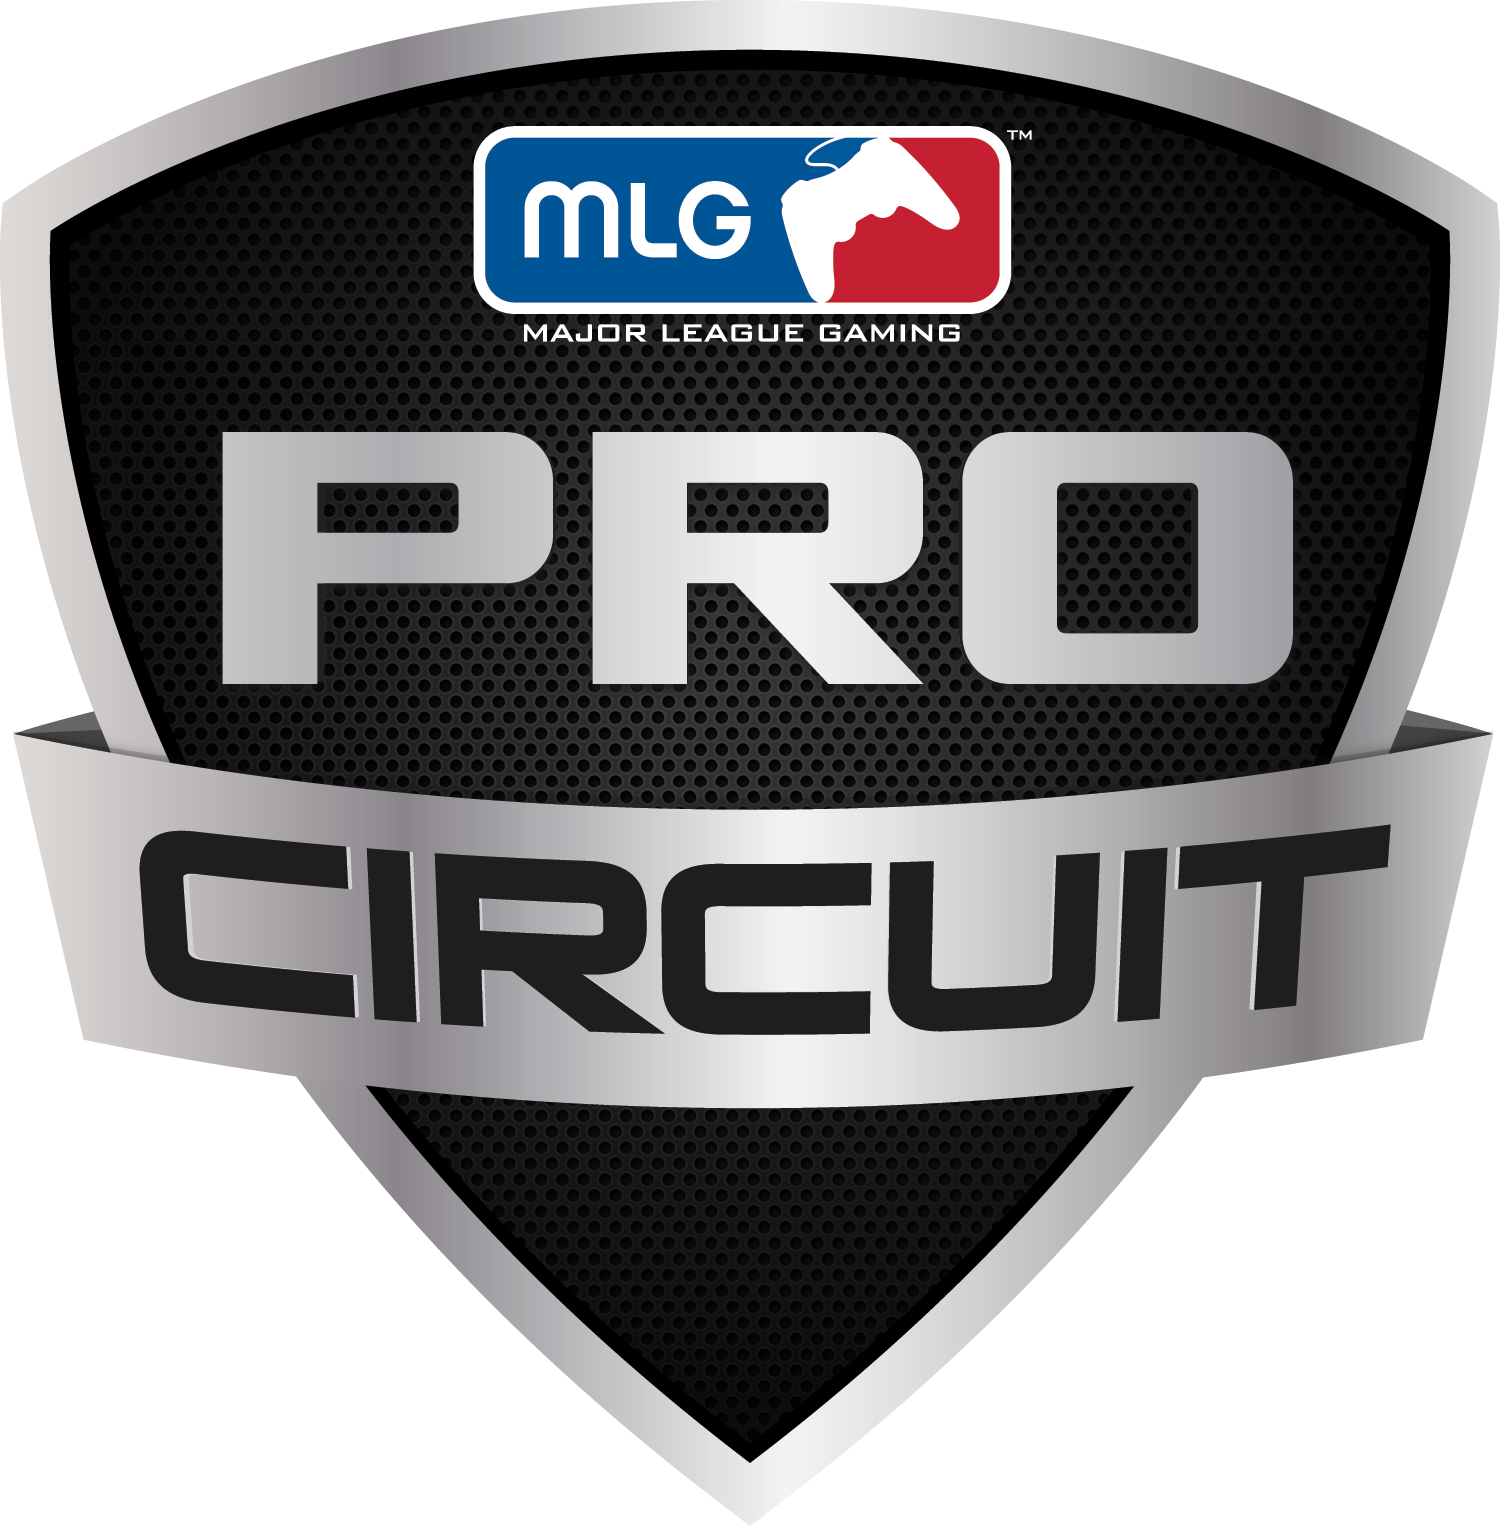 File:Mlg-pro-circuit-logo png - Leaguepedia | League of